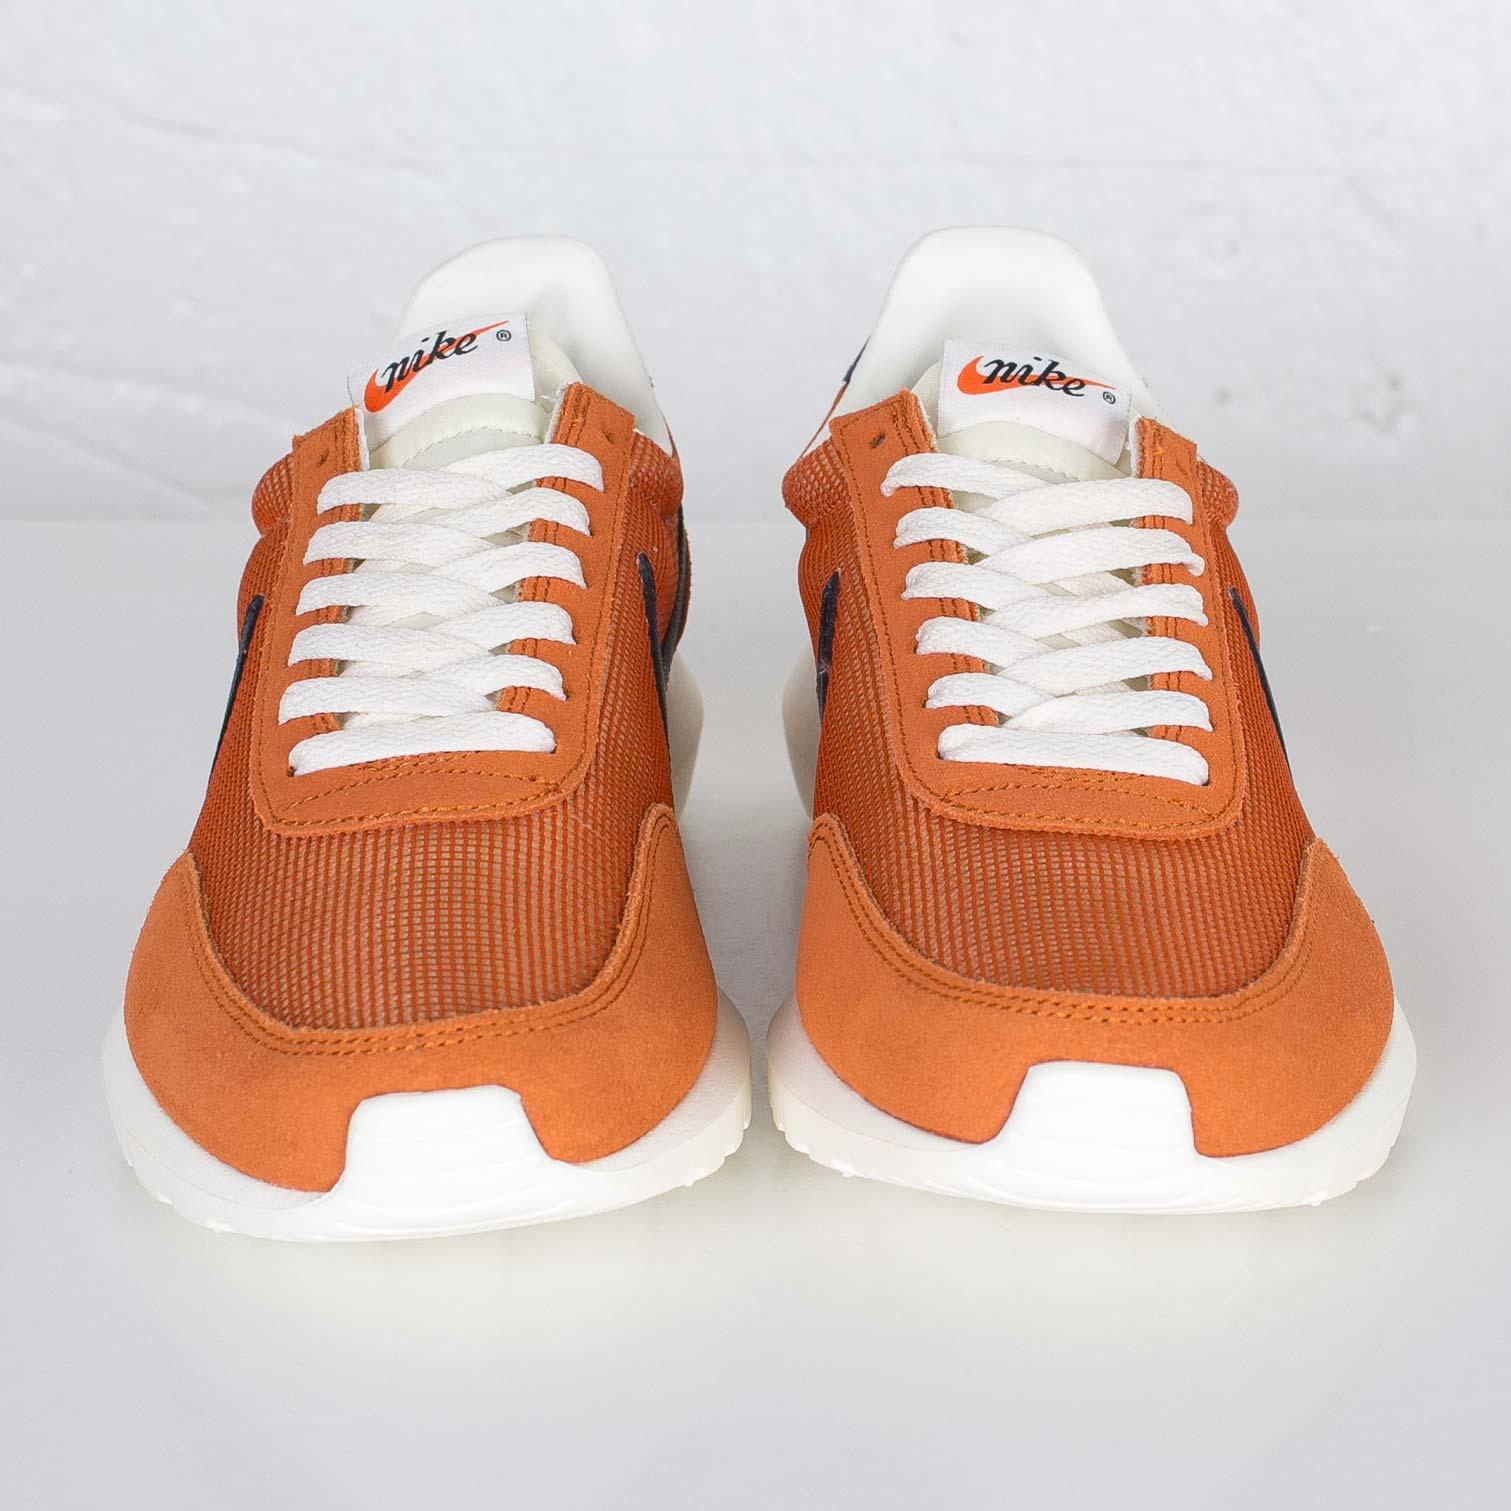 new style 3b454 40bf2 Nike Roshe Daybreak NM - 826666-804 - Sneakersnstuff   sneakers    streetwear online since 1999